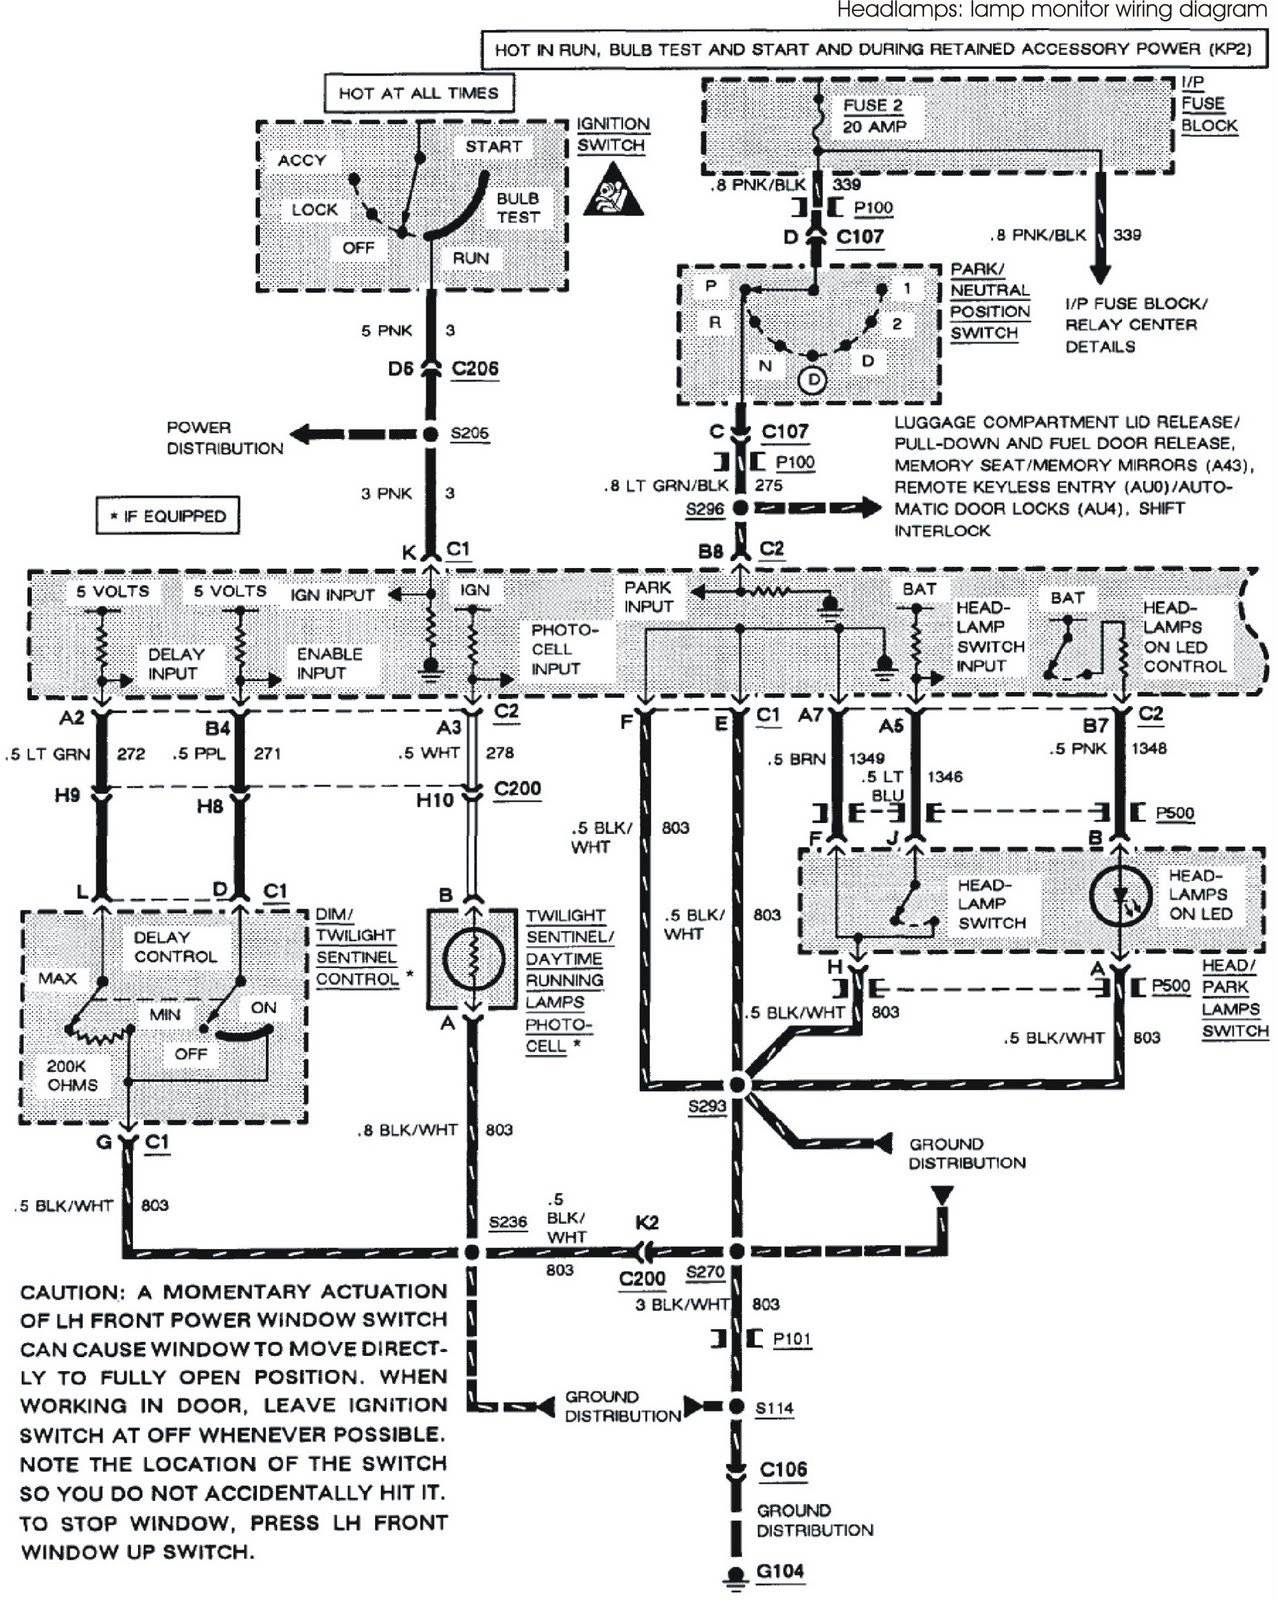 Pat Monsoon Amp Wiring Diagram on 2002 grand am radio connector diagram, 2006 impala speaker head unit diagram, 2006 pontiac g6 factory radio diagram, monsoon amp wiring colors, delphi delco radio diagram, monsoon amp repair, 2009 pontiac g6 monsoon amp diagram, gm monsoon radio plug diagram, monsoon audio, monsoon winds diagram, 2002 trailblazer radio plug diagram,